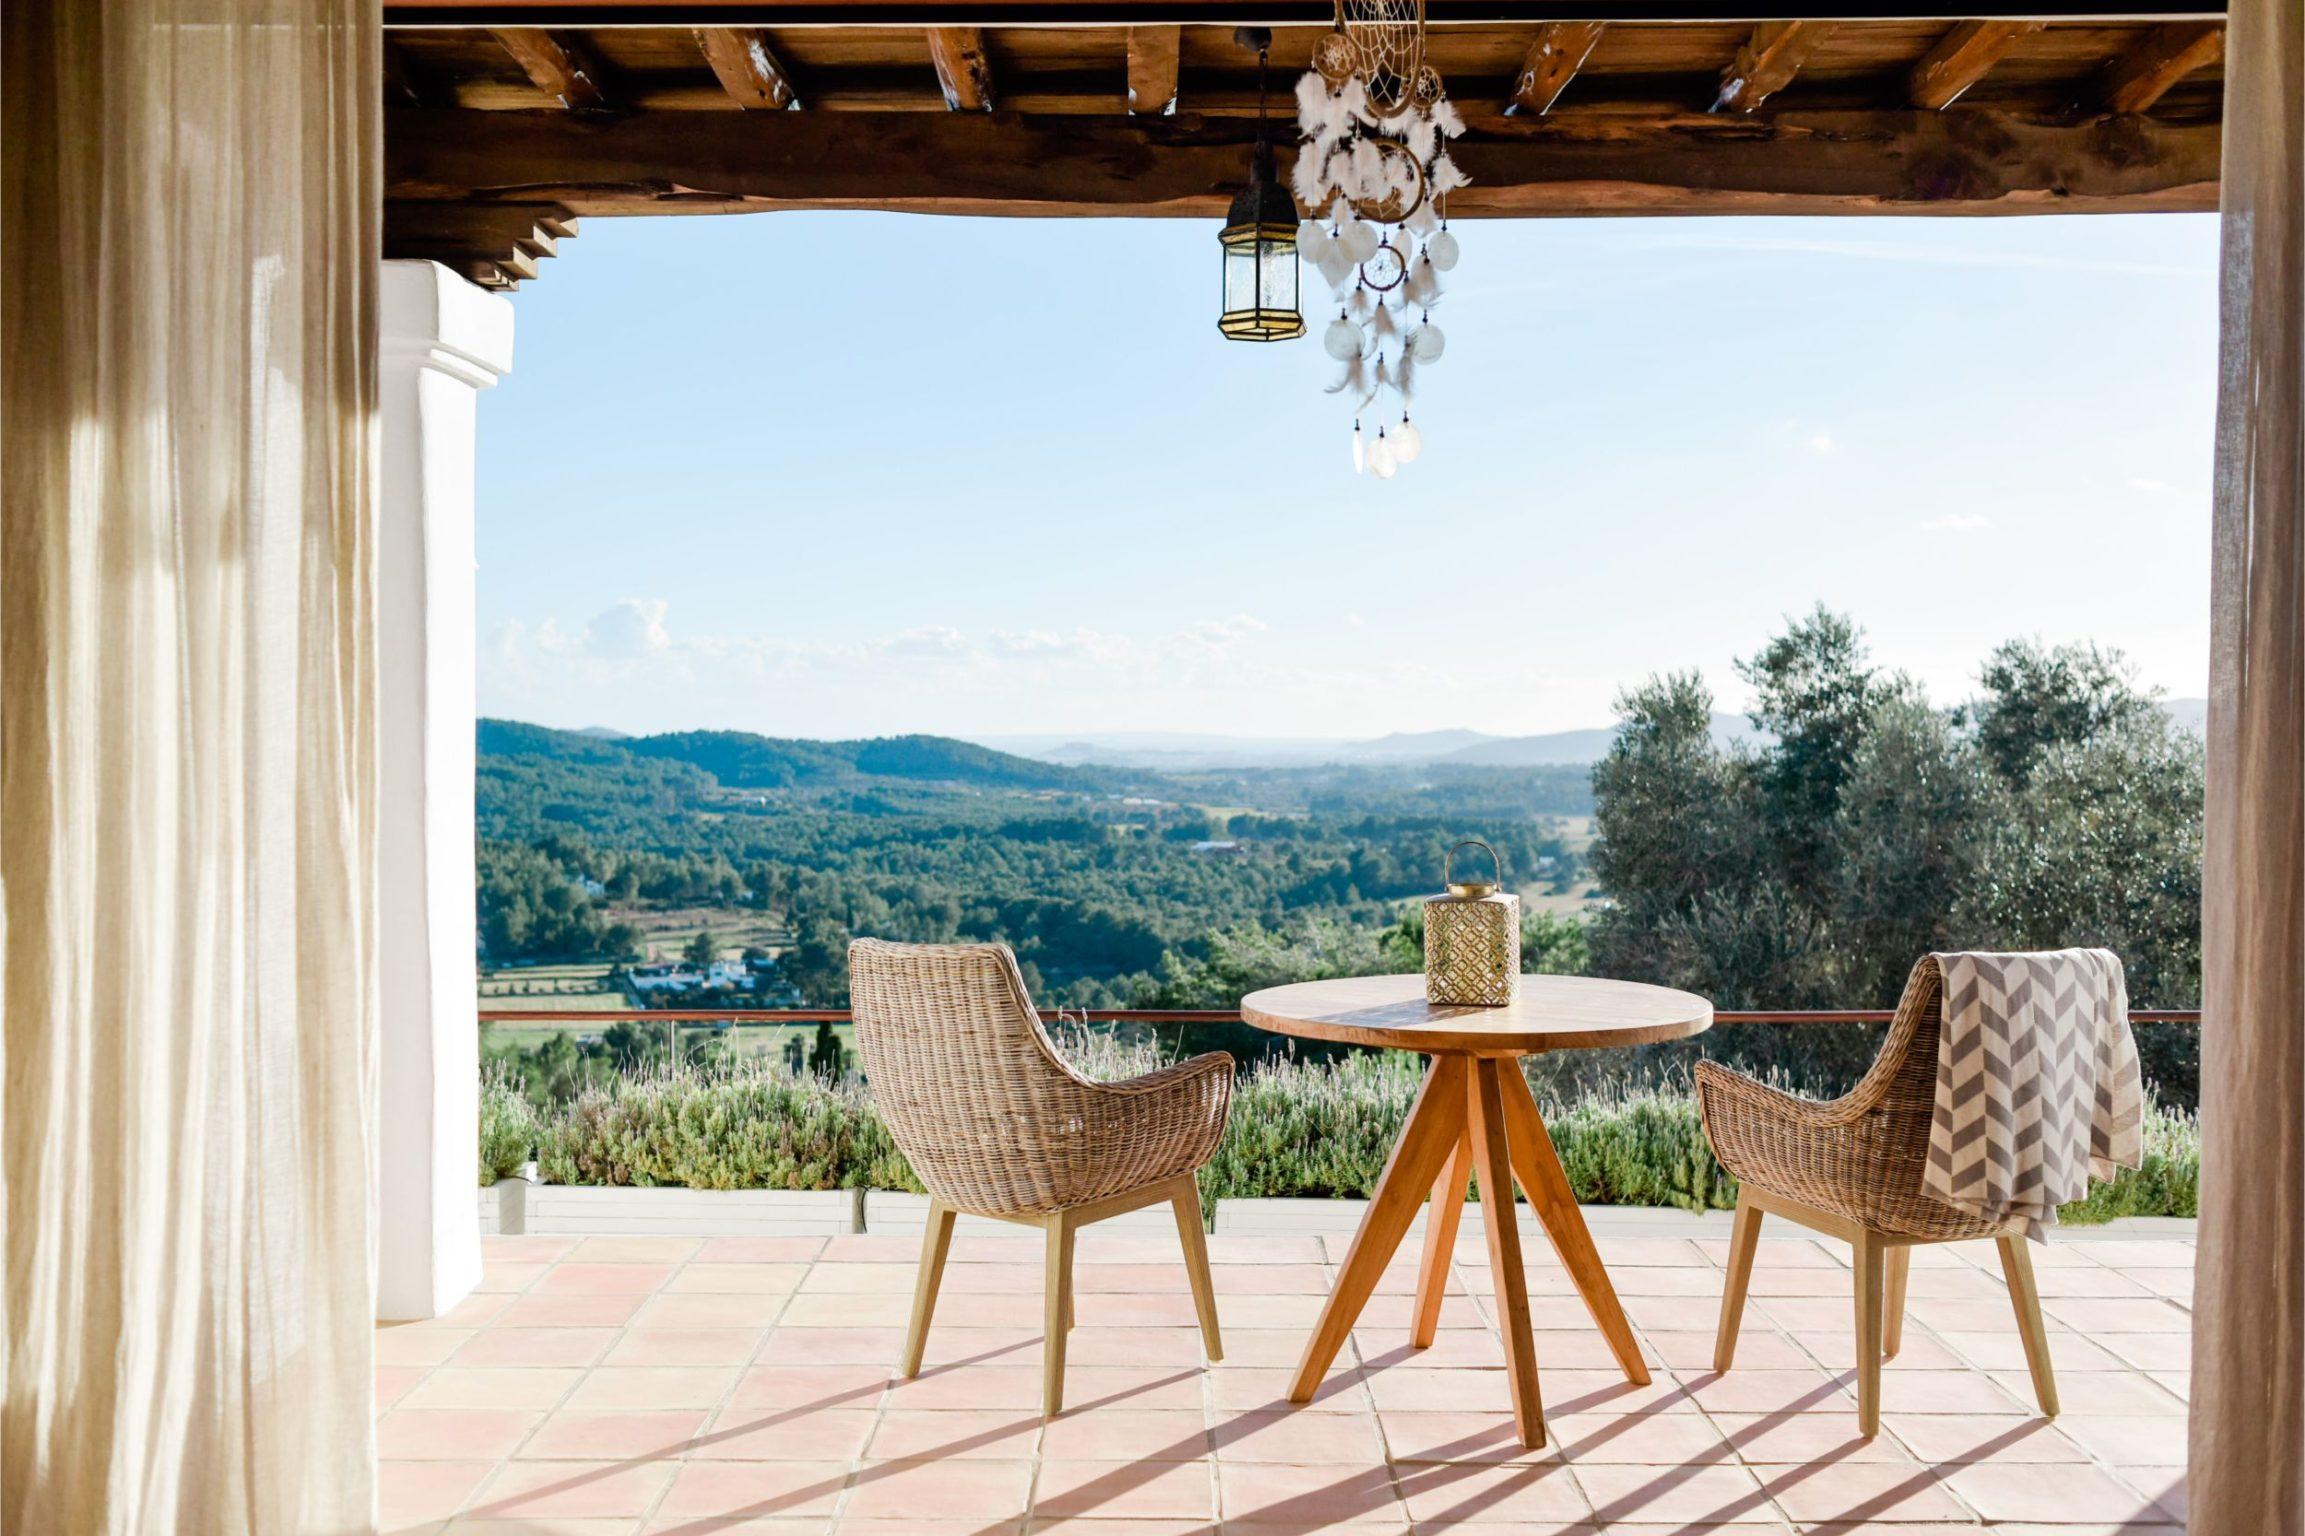 https://www.white-ibiza.com/wp-content/uploads/2020/02/white-ibiza-villas-can-lavanda-outdoors-4-2305x1536.jpg